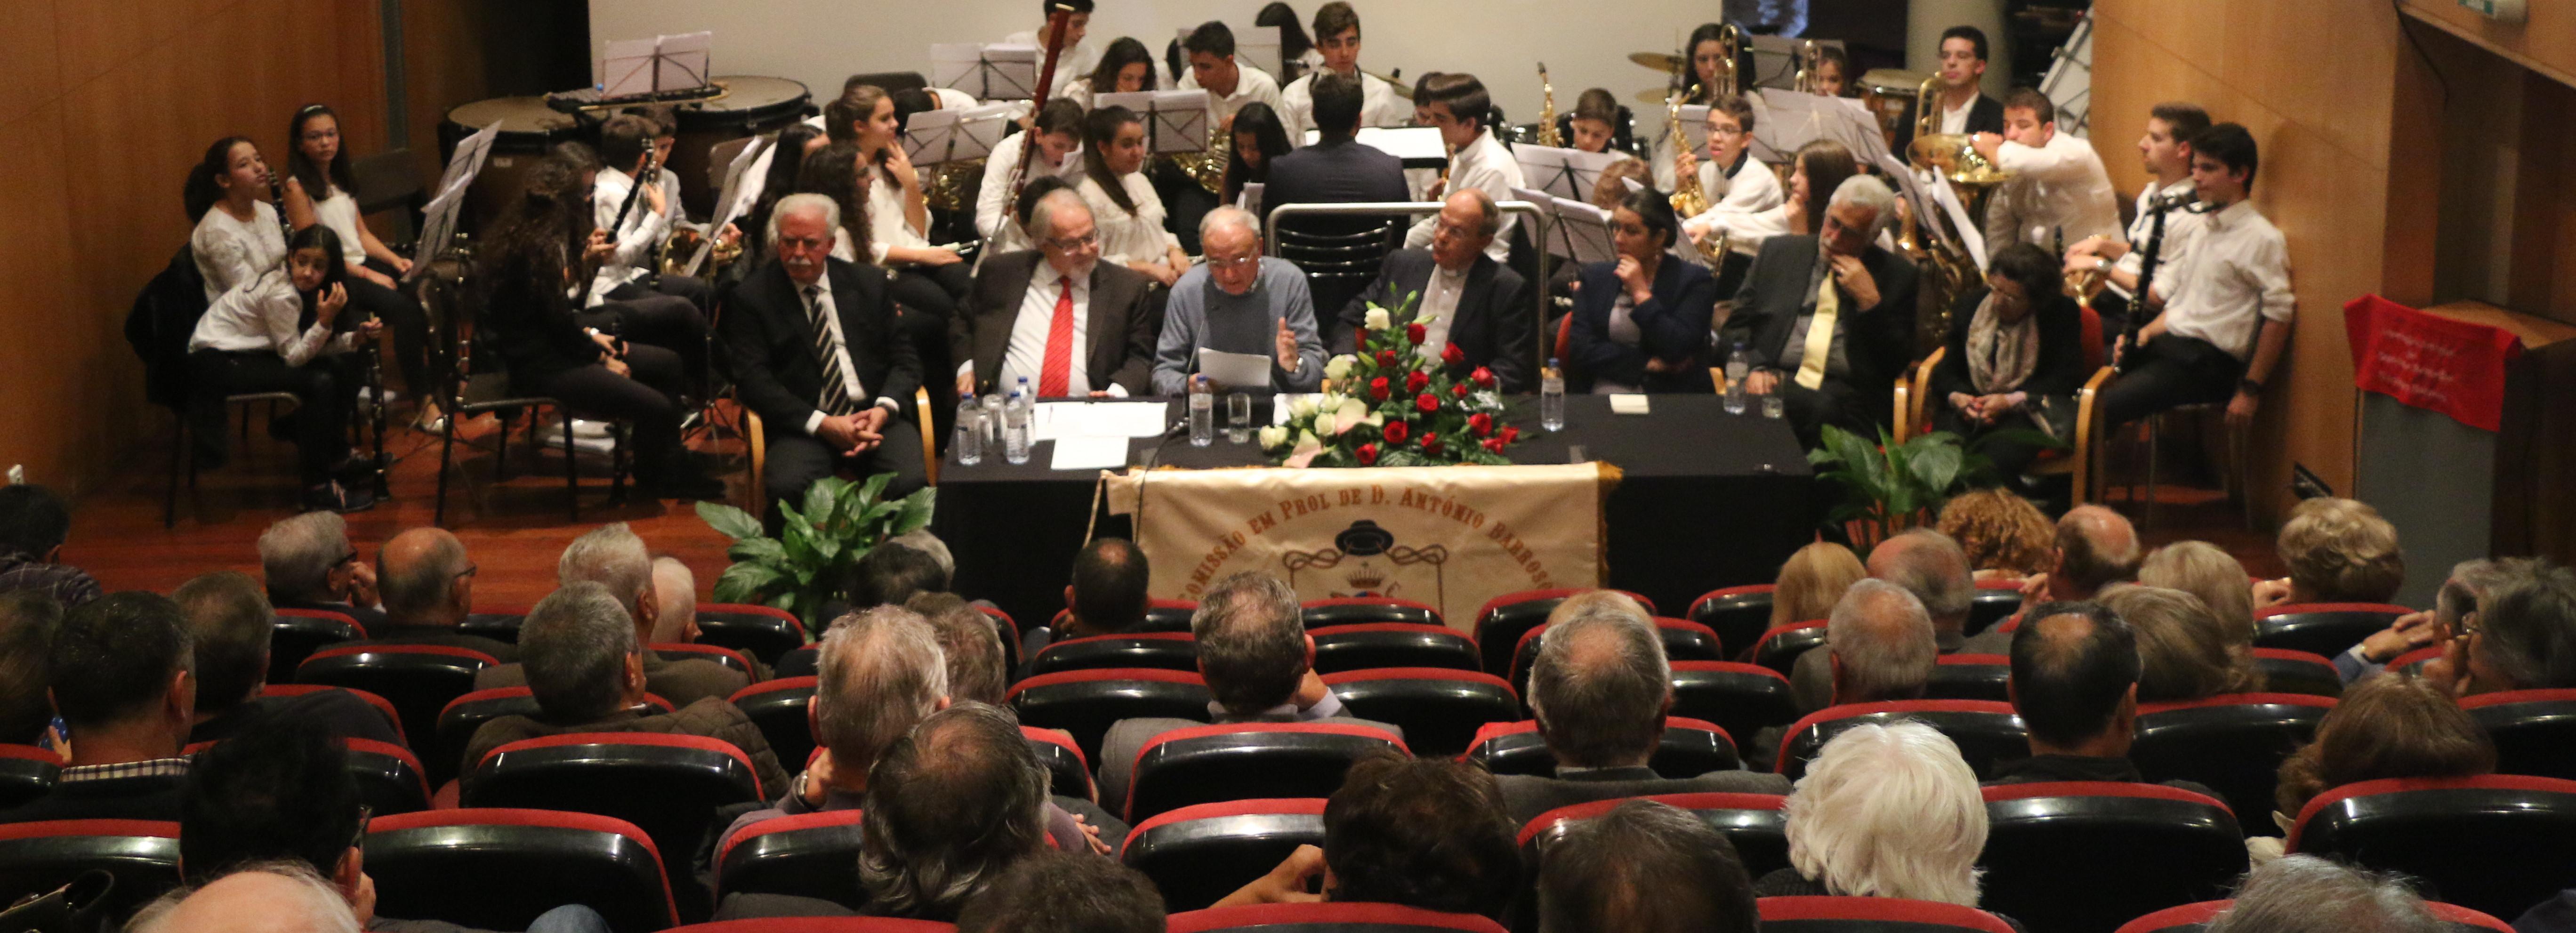 Bispo D. António Barroso homenageado na Biblioteca Municipal